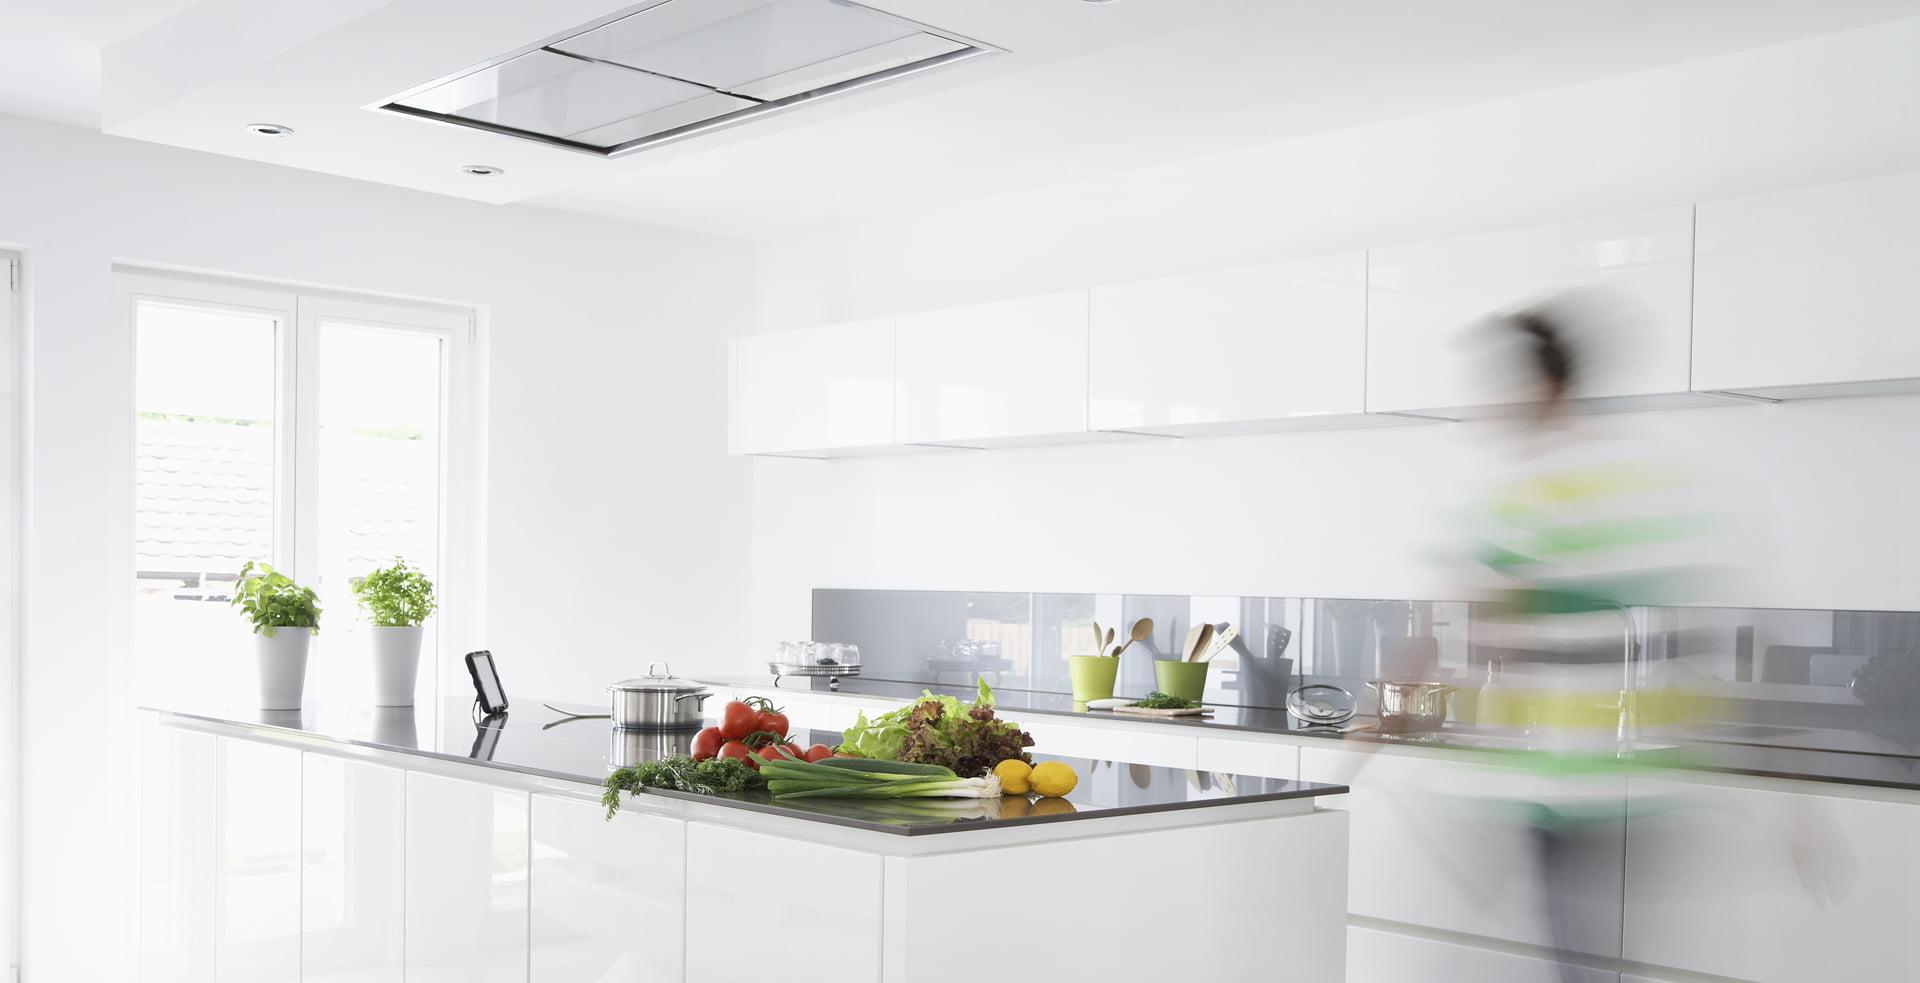 co cuisine design r novation de cuisine refacing laval montr al. Black Bedroom Furniture Sets. Home Design Ideas